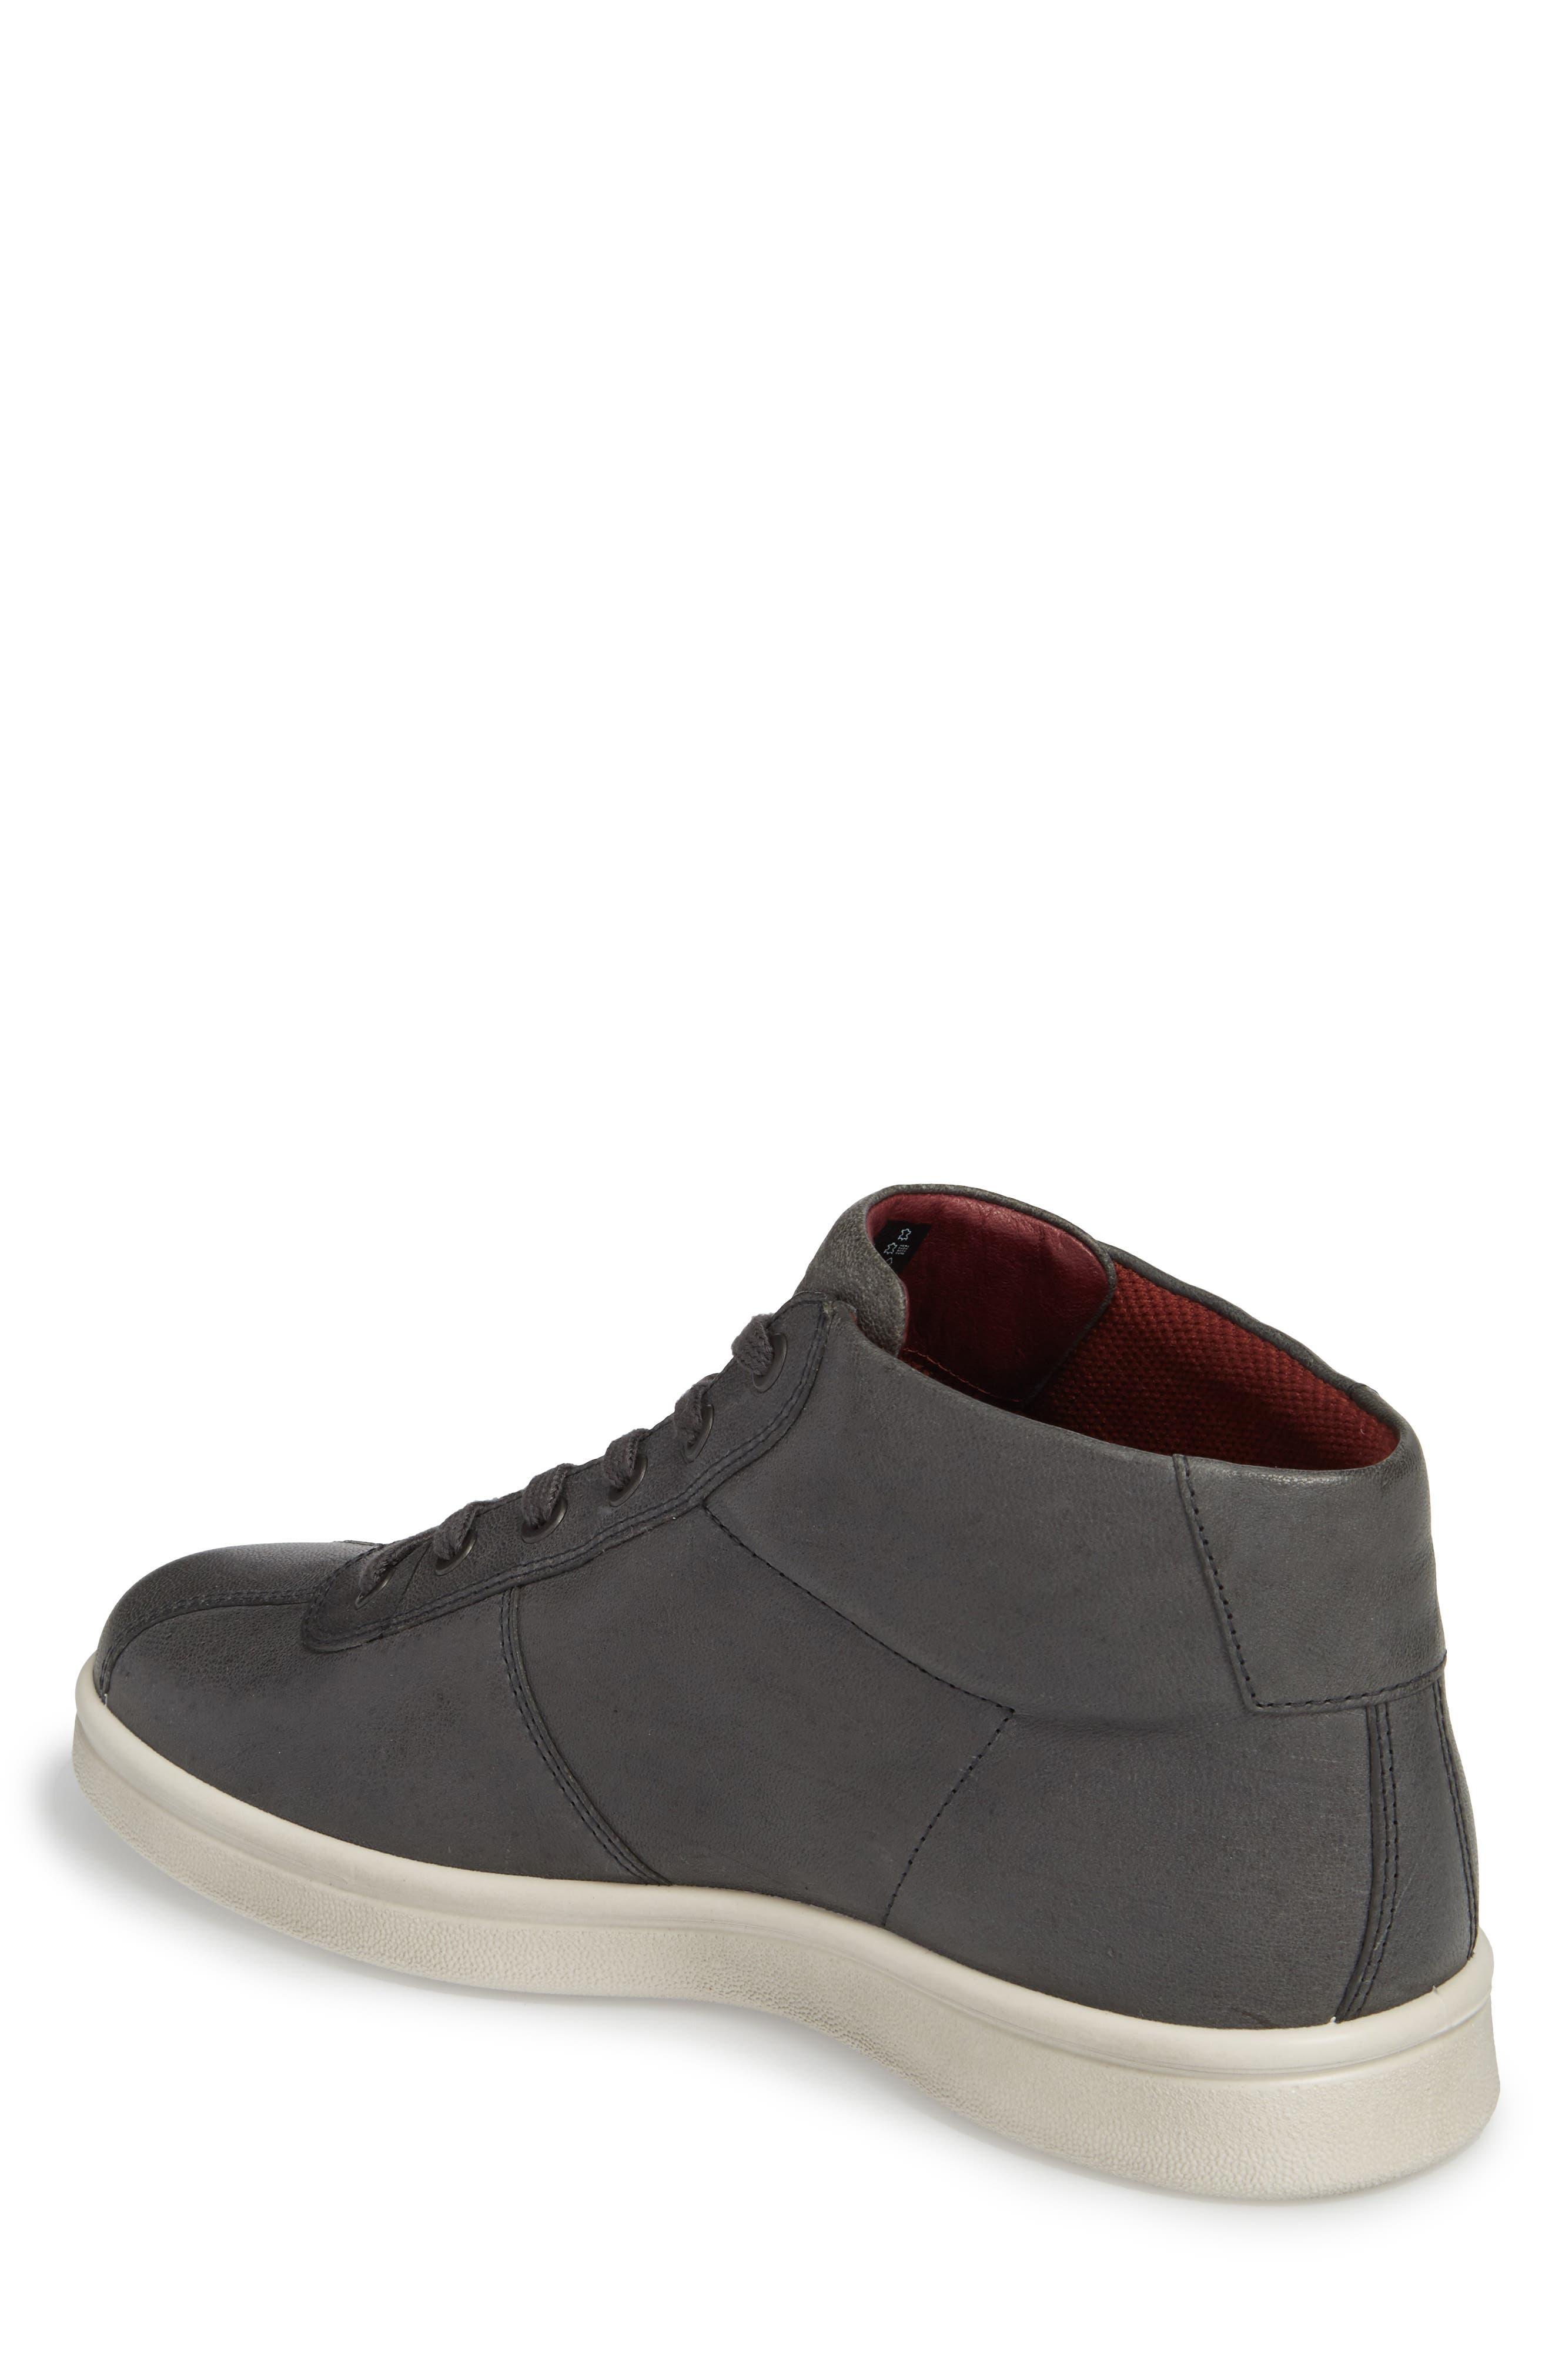 Kallum High Top Sneaker,                             Alternate thumbnail 2, color,                             Moonless Leather